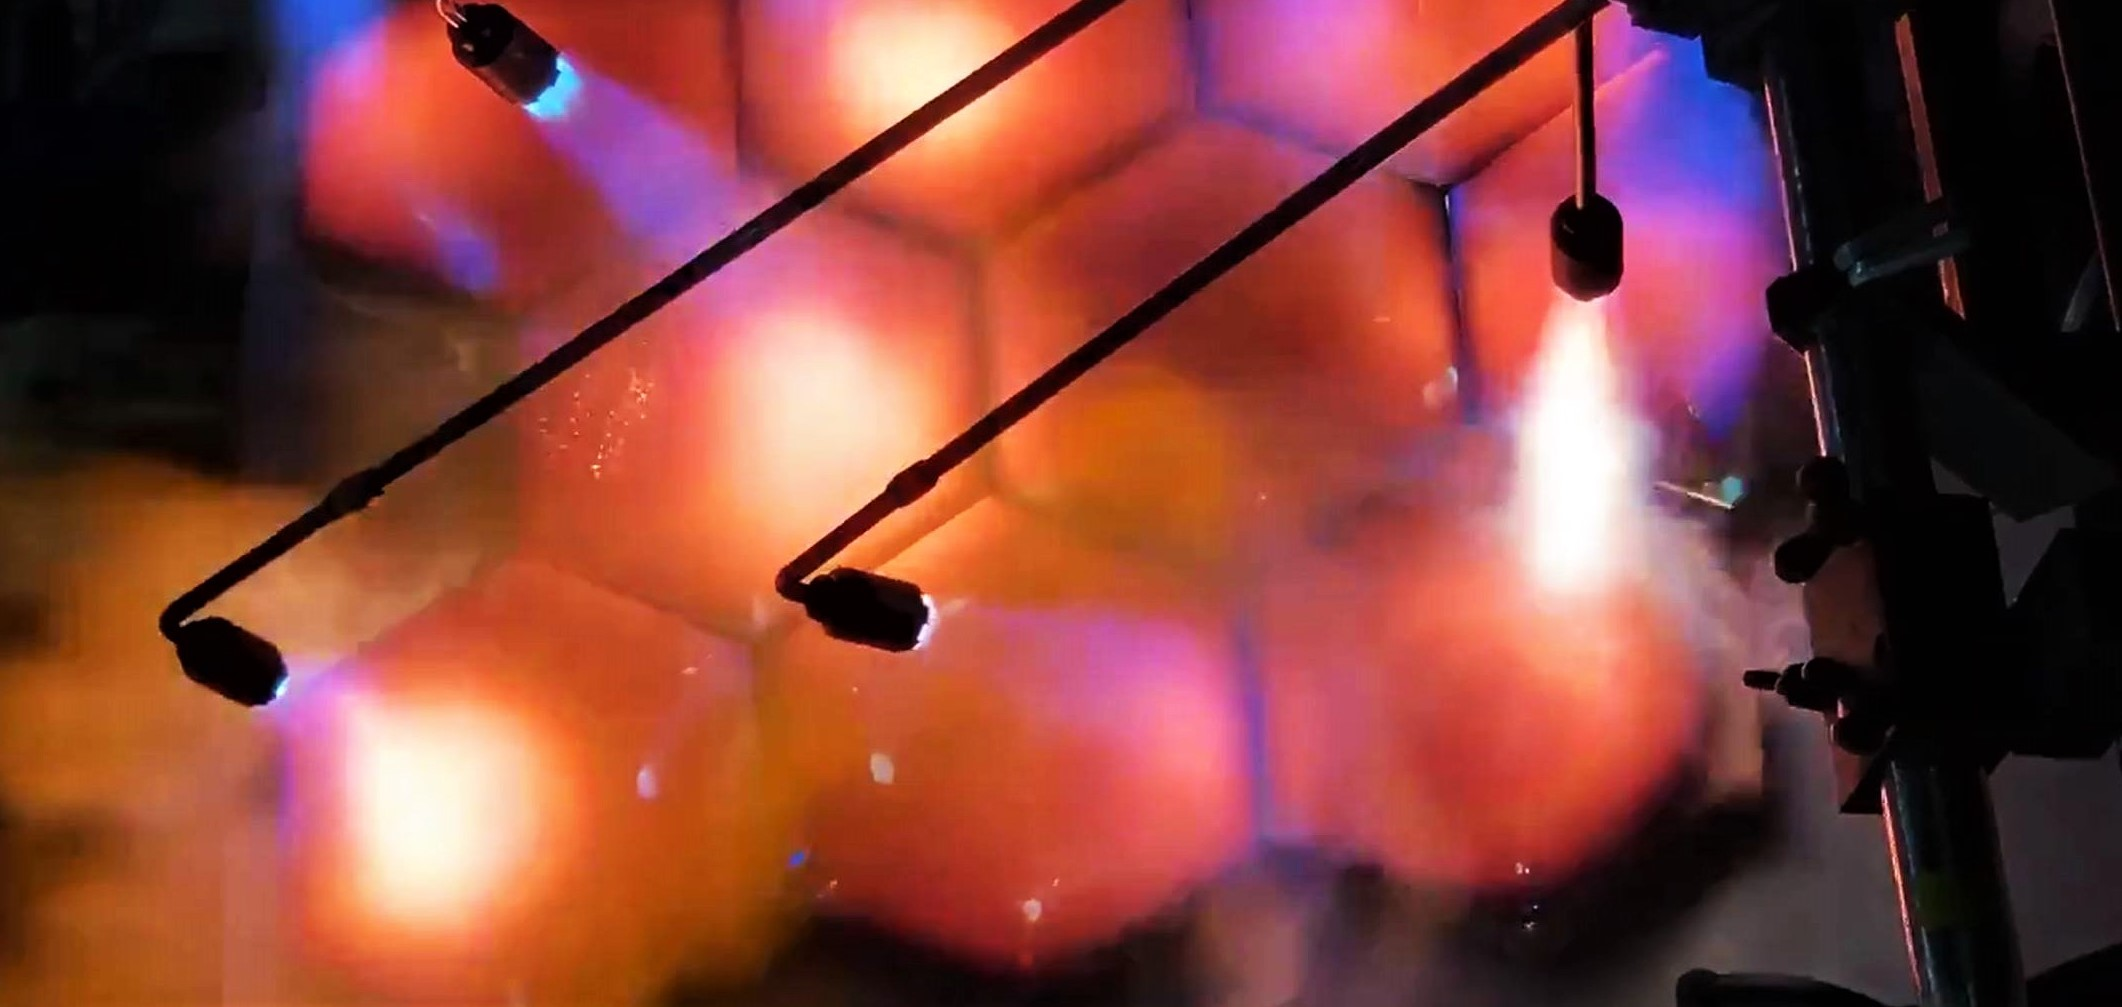 Starship hexagonal heat shield tile testing 031719 (Elon Musk – SpaceX) 1 crop